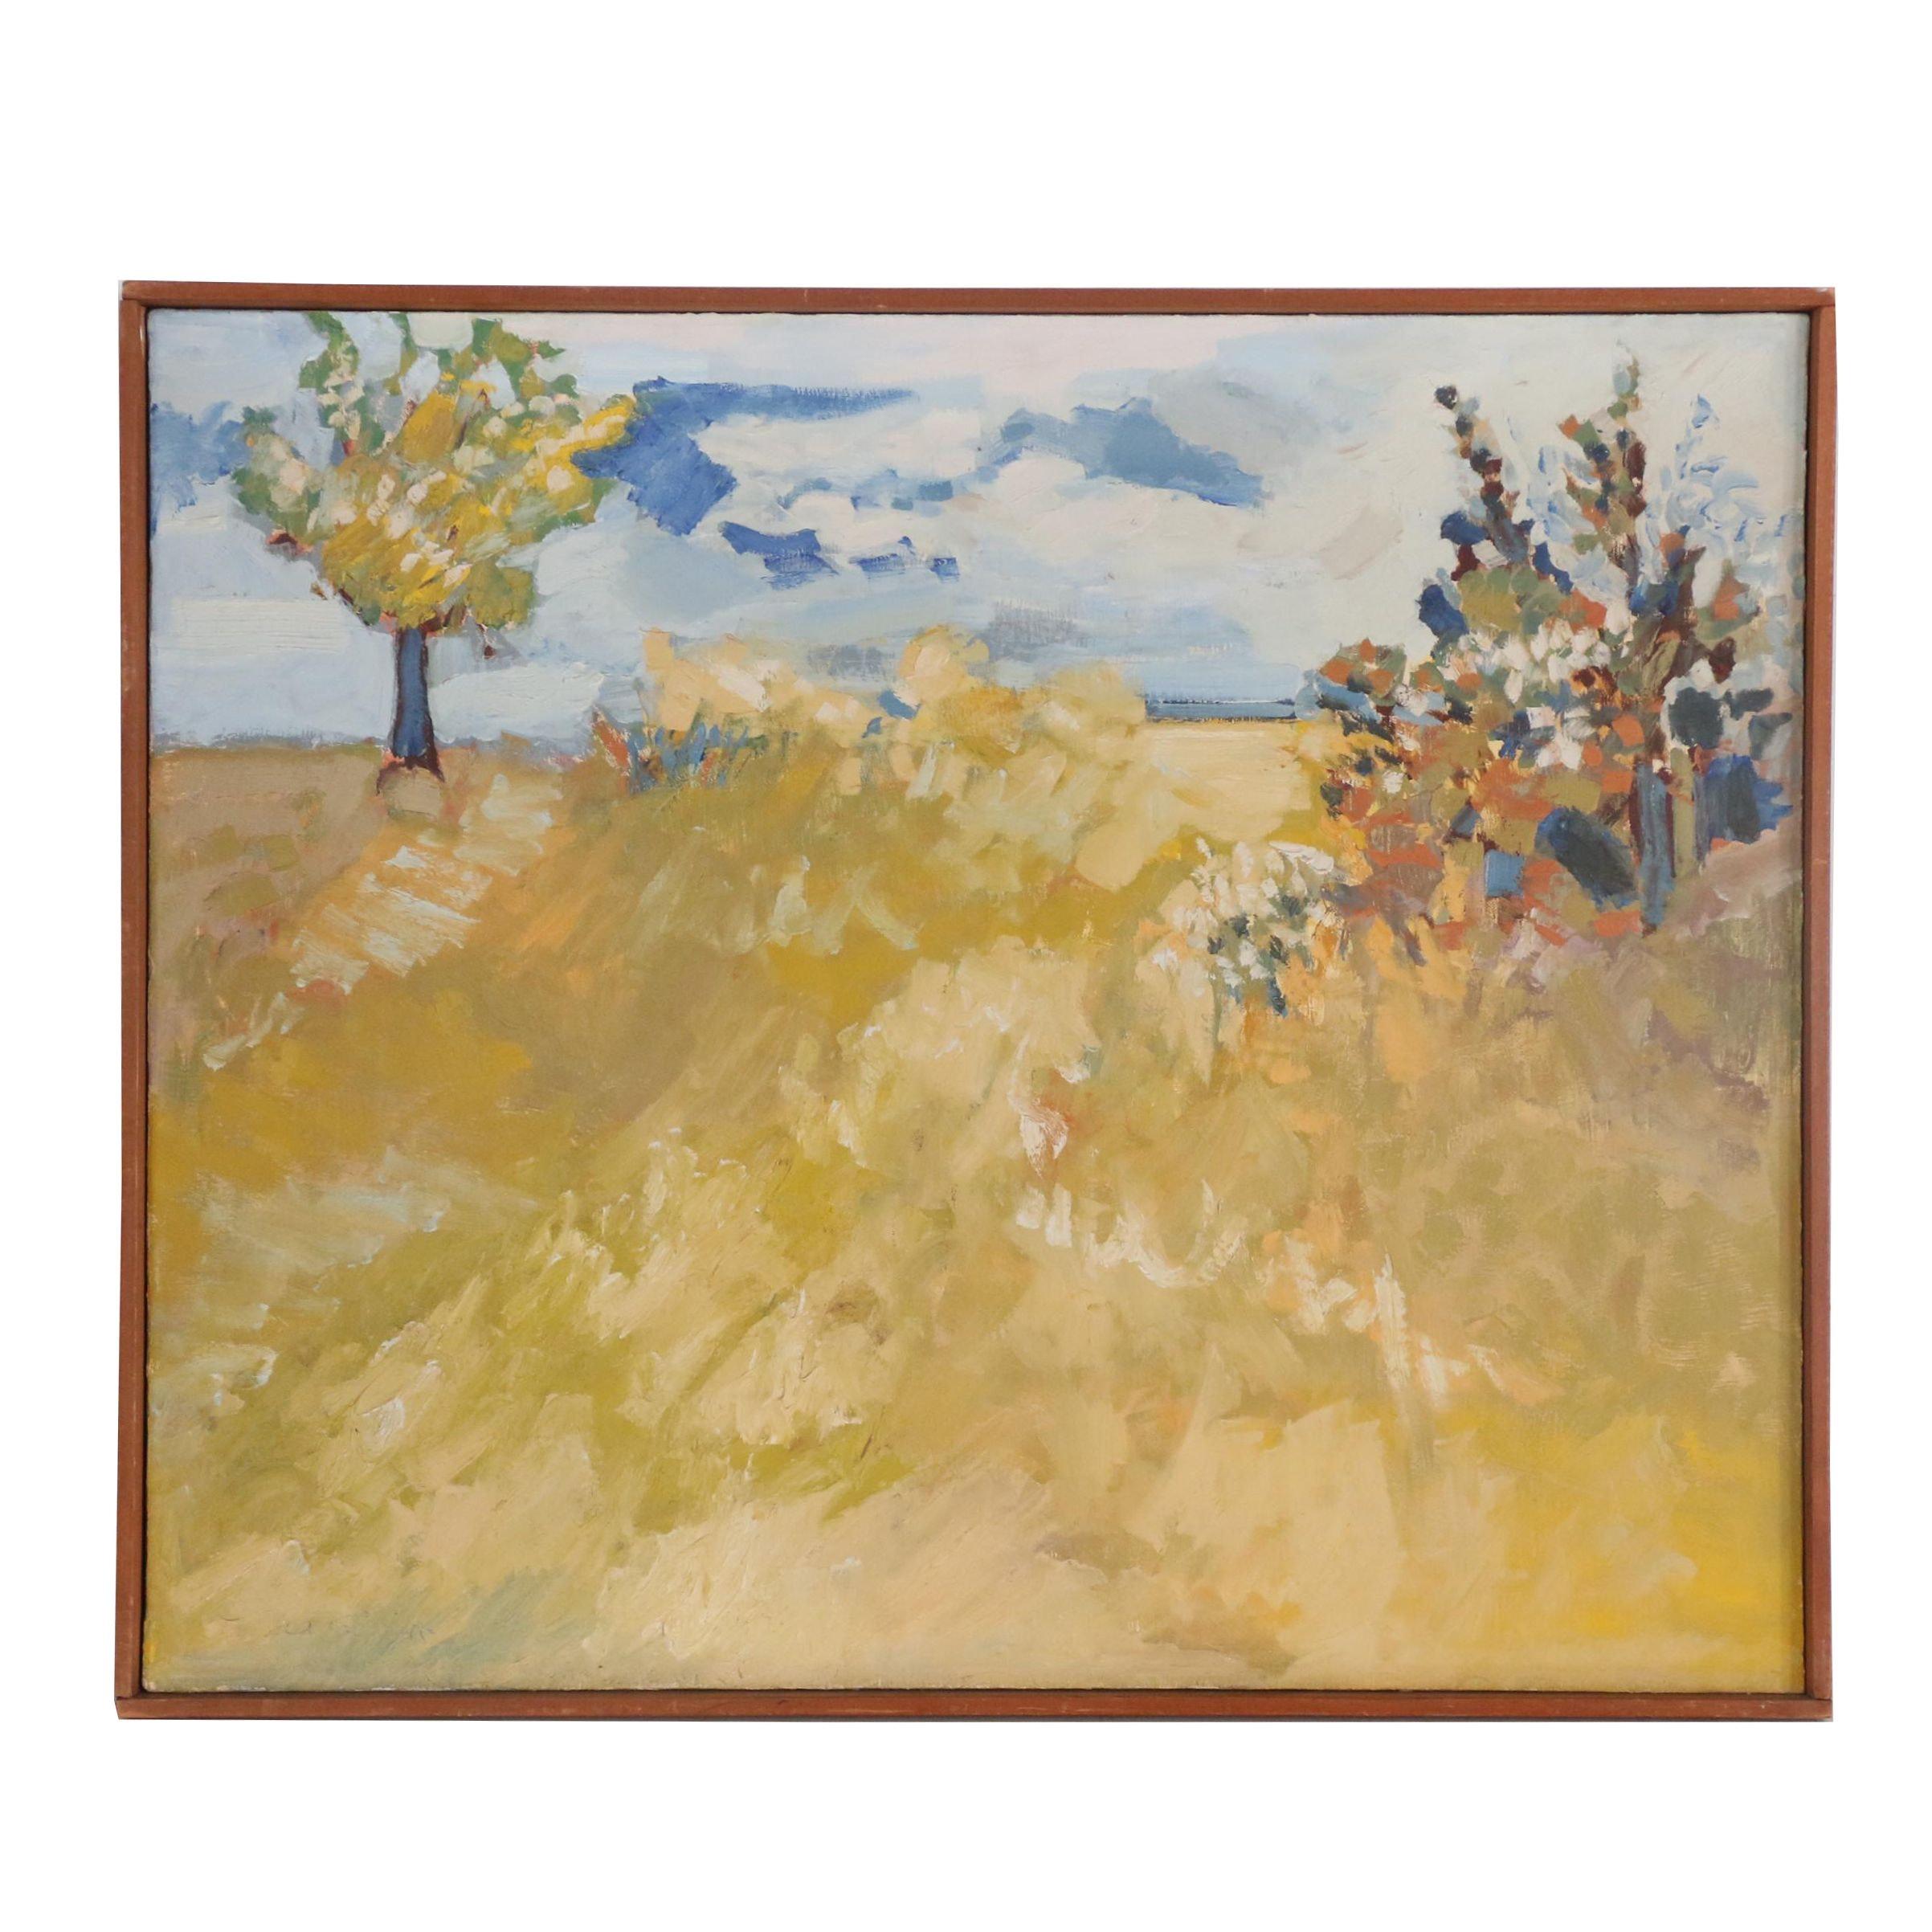 "Lee Guilliatt Oil Painting ""New England Landscape"", 1967"